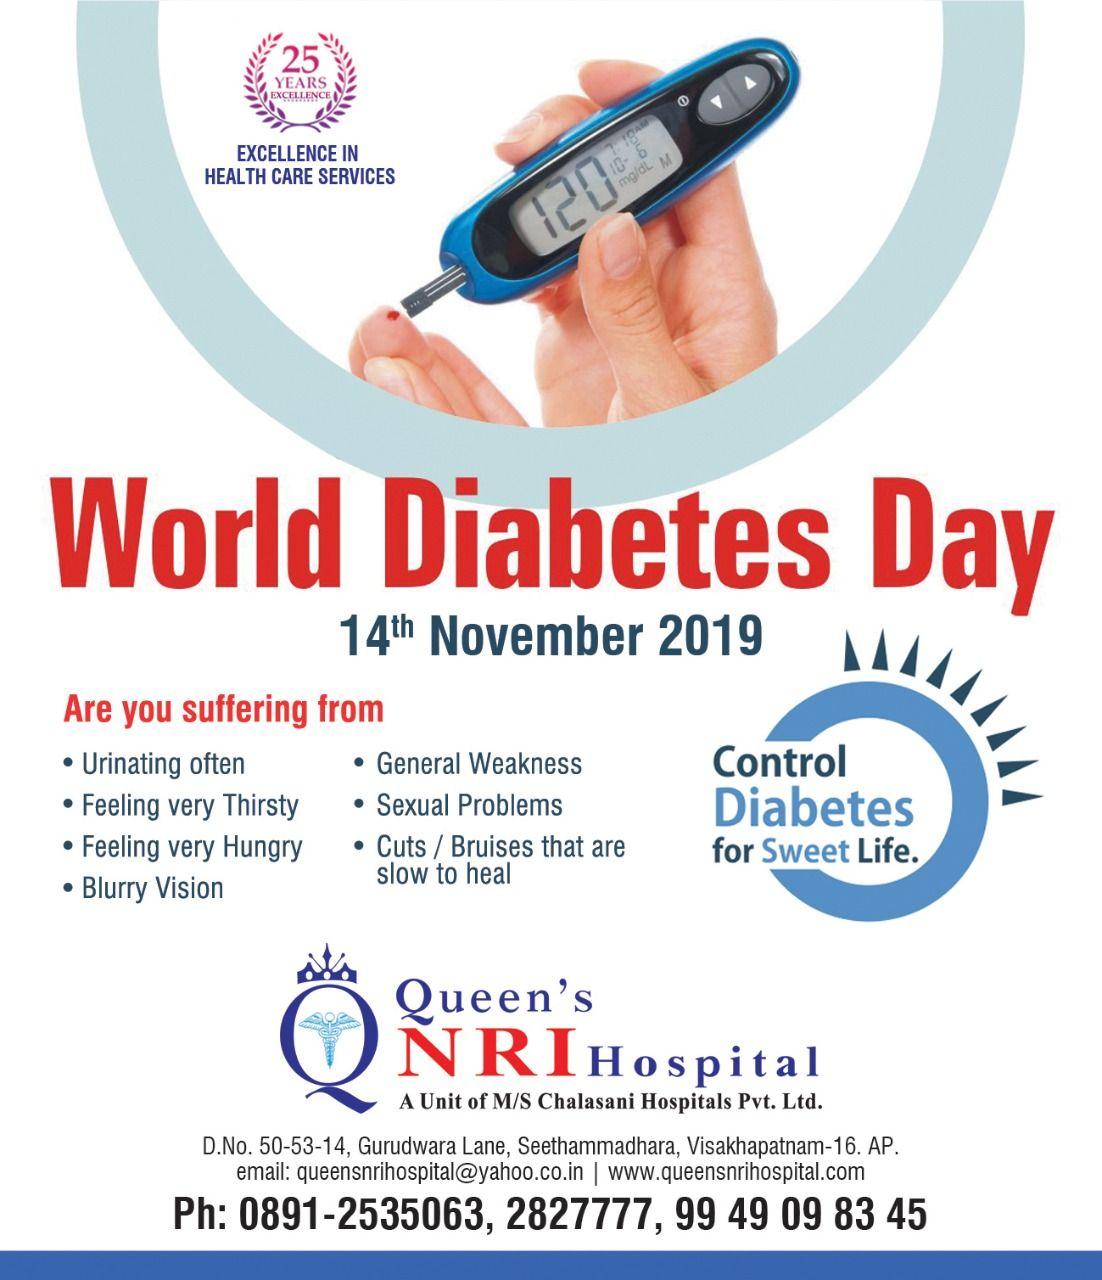 World Diabetes Day 14th November 2019 Queen's NRI